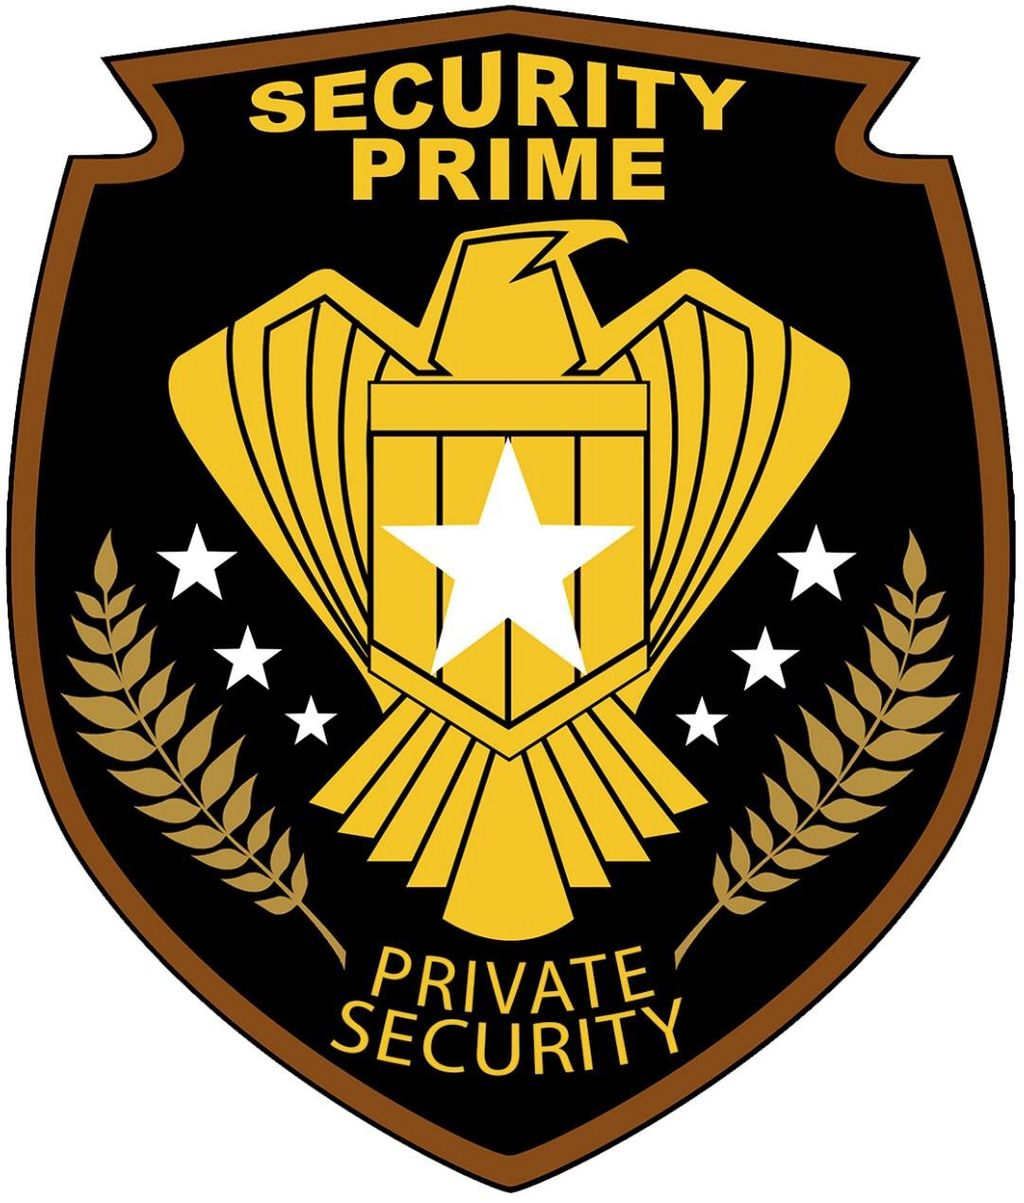 Security Prime